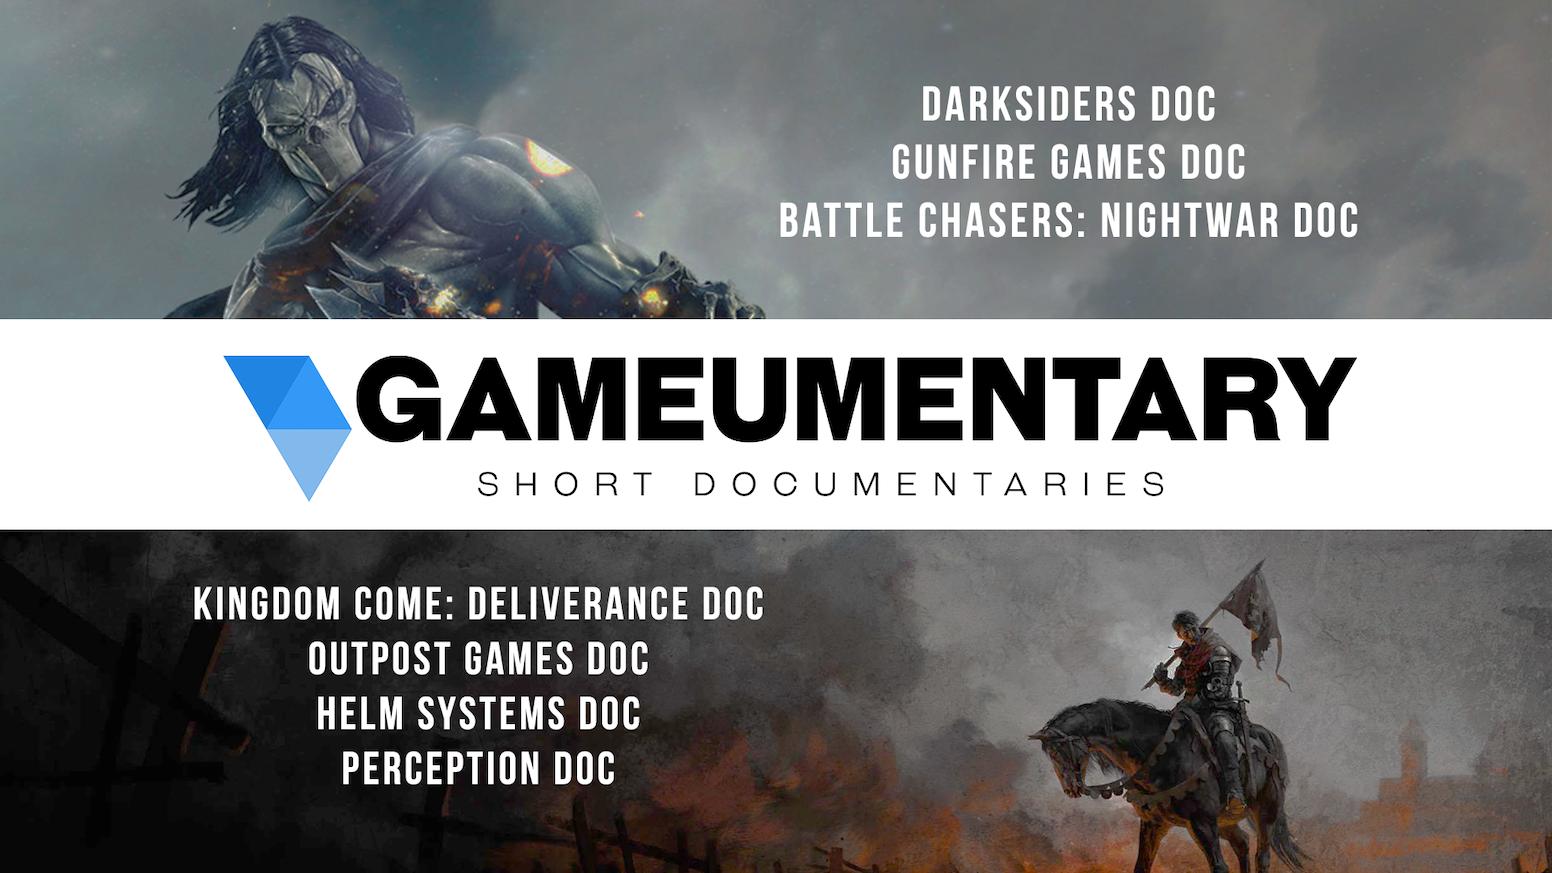 Gameumentary Video Game Documentaries By Gameumentary Kickstarter - Docu games